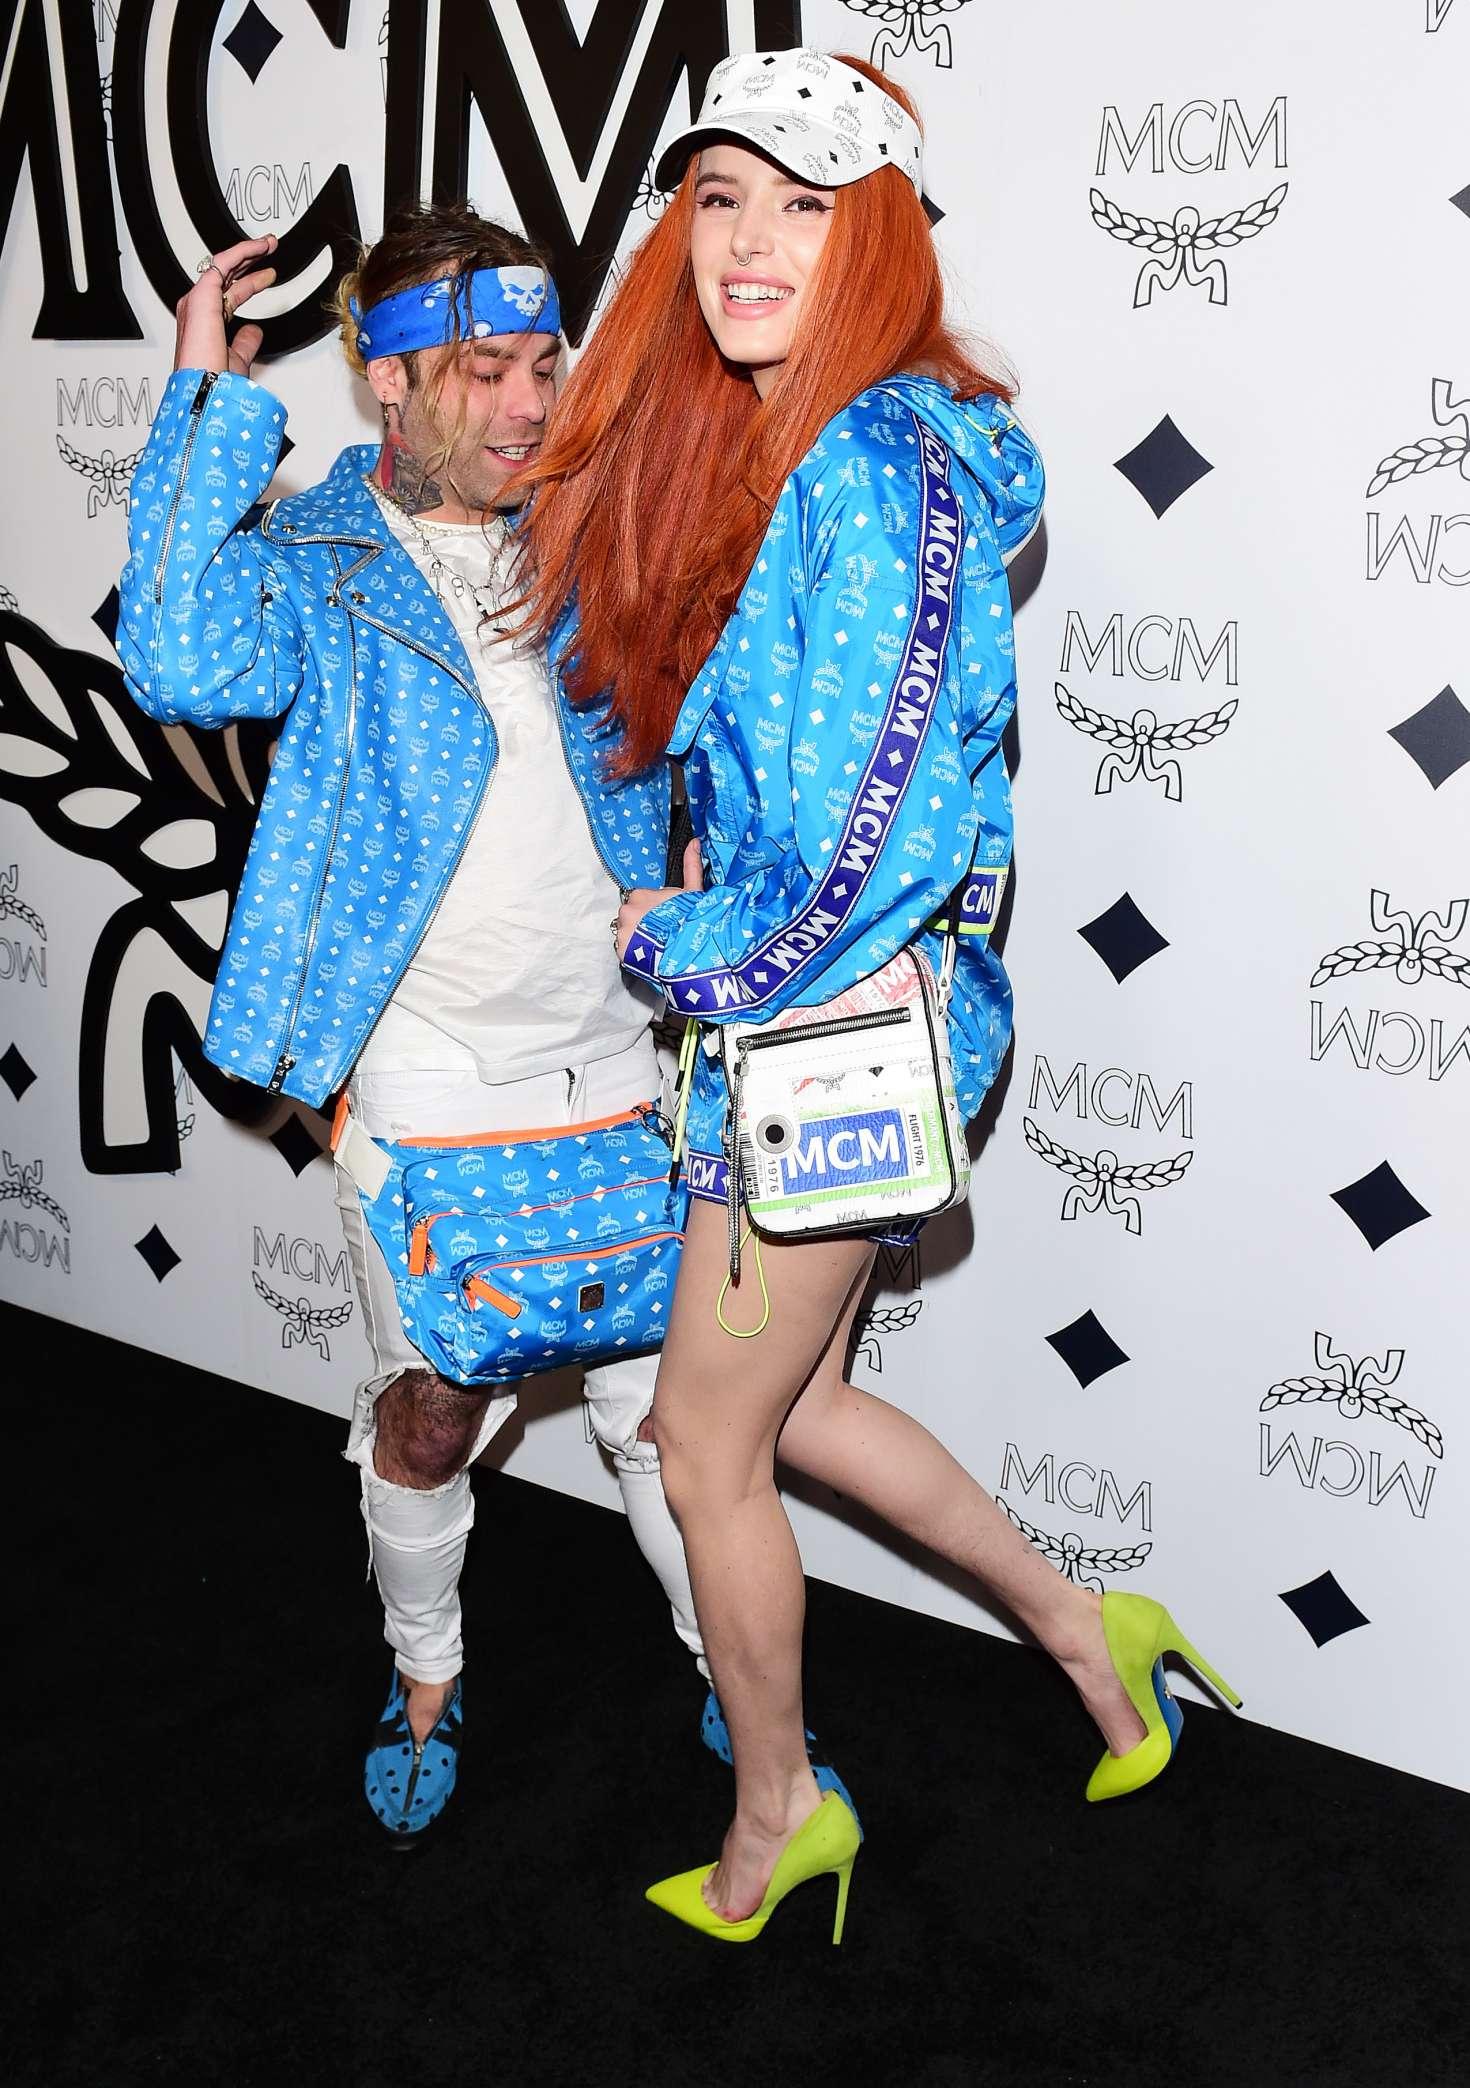 Bella Thorne 2019 : Bella Thorne: Neiman Marcus Hudson Yards Party -09